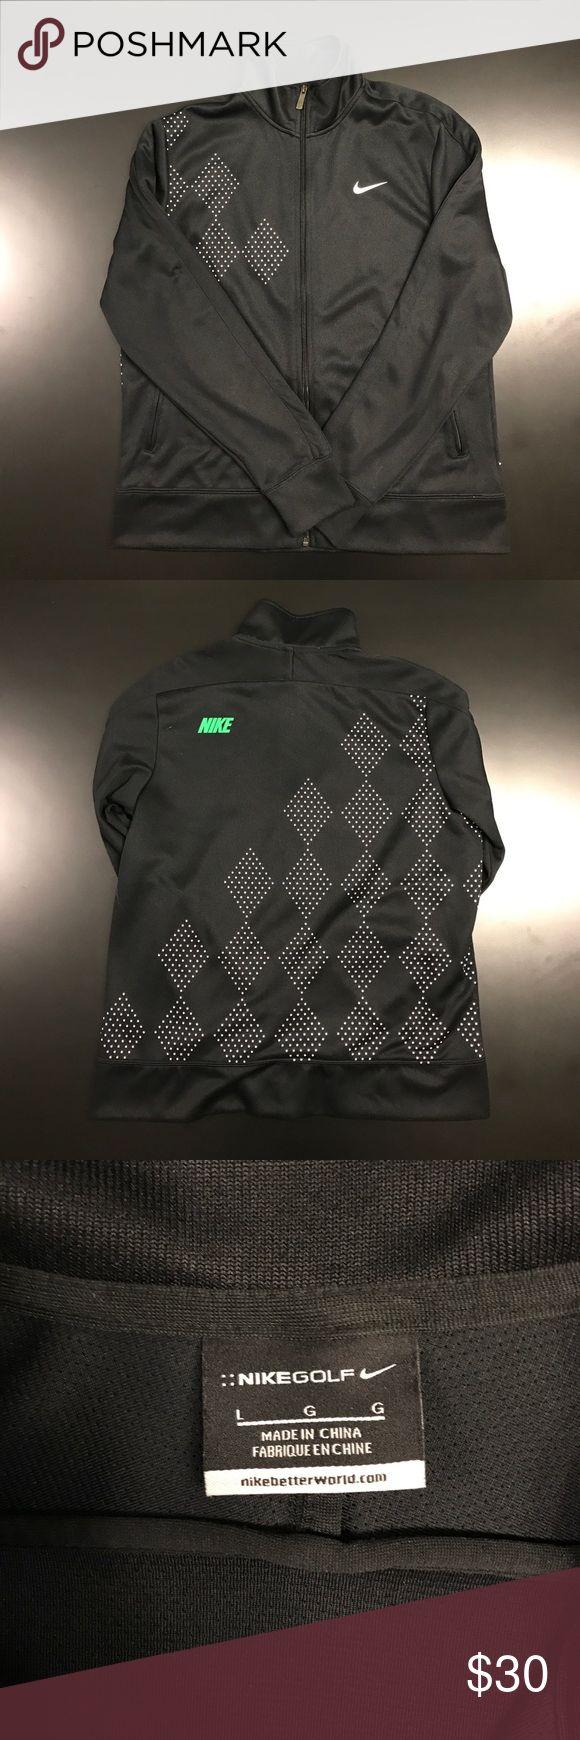 Nike Golf Jacket Great condition golf jacket Nike Jackets & Coats Performance Jackets